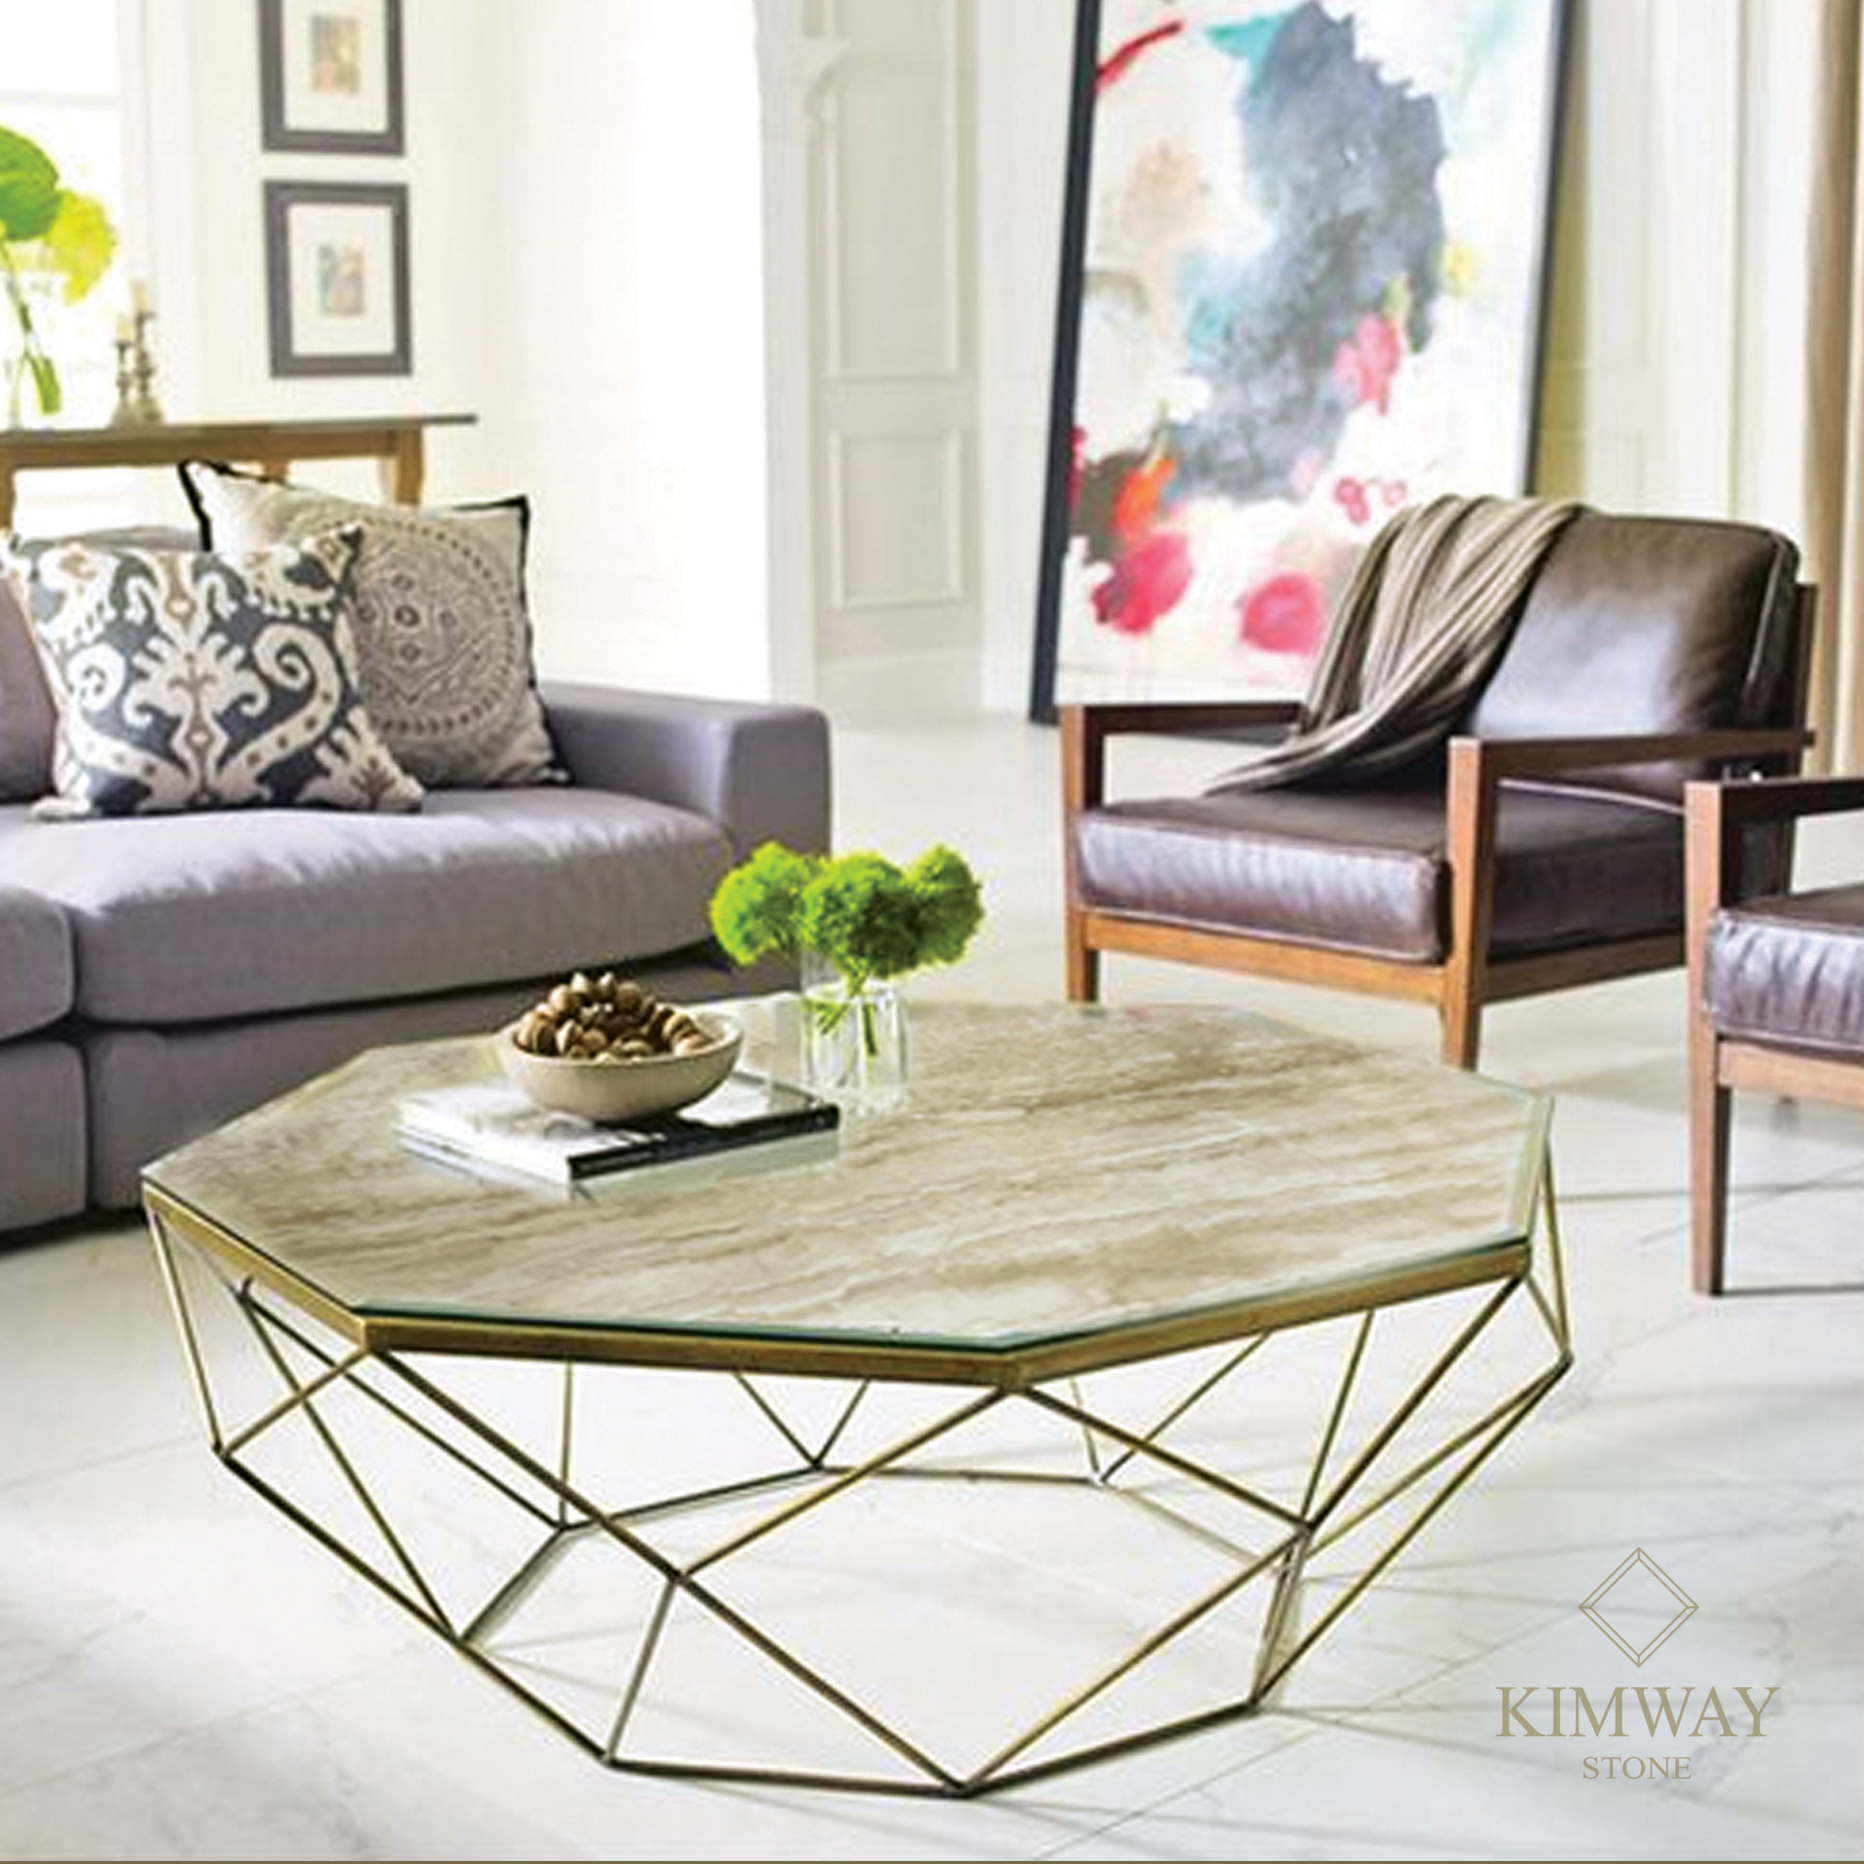 Dyno Beige Octagon Coffee Table Kimway Stone Granite Marble